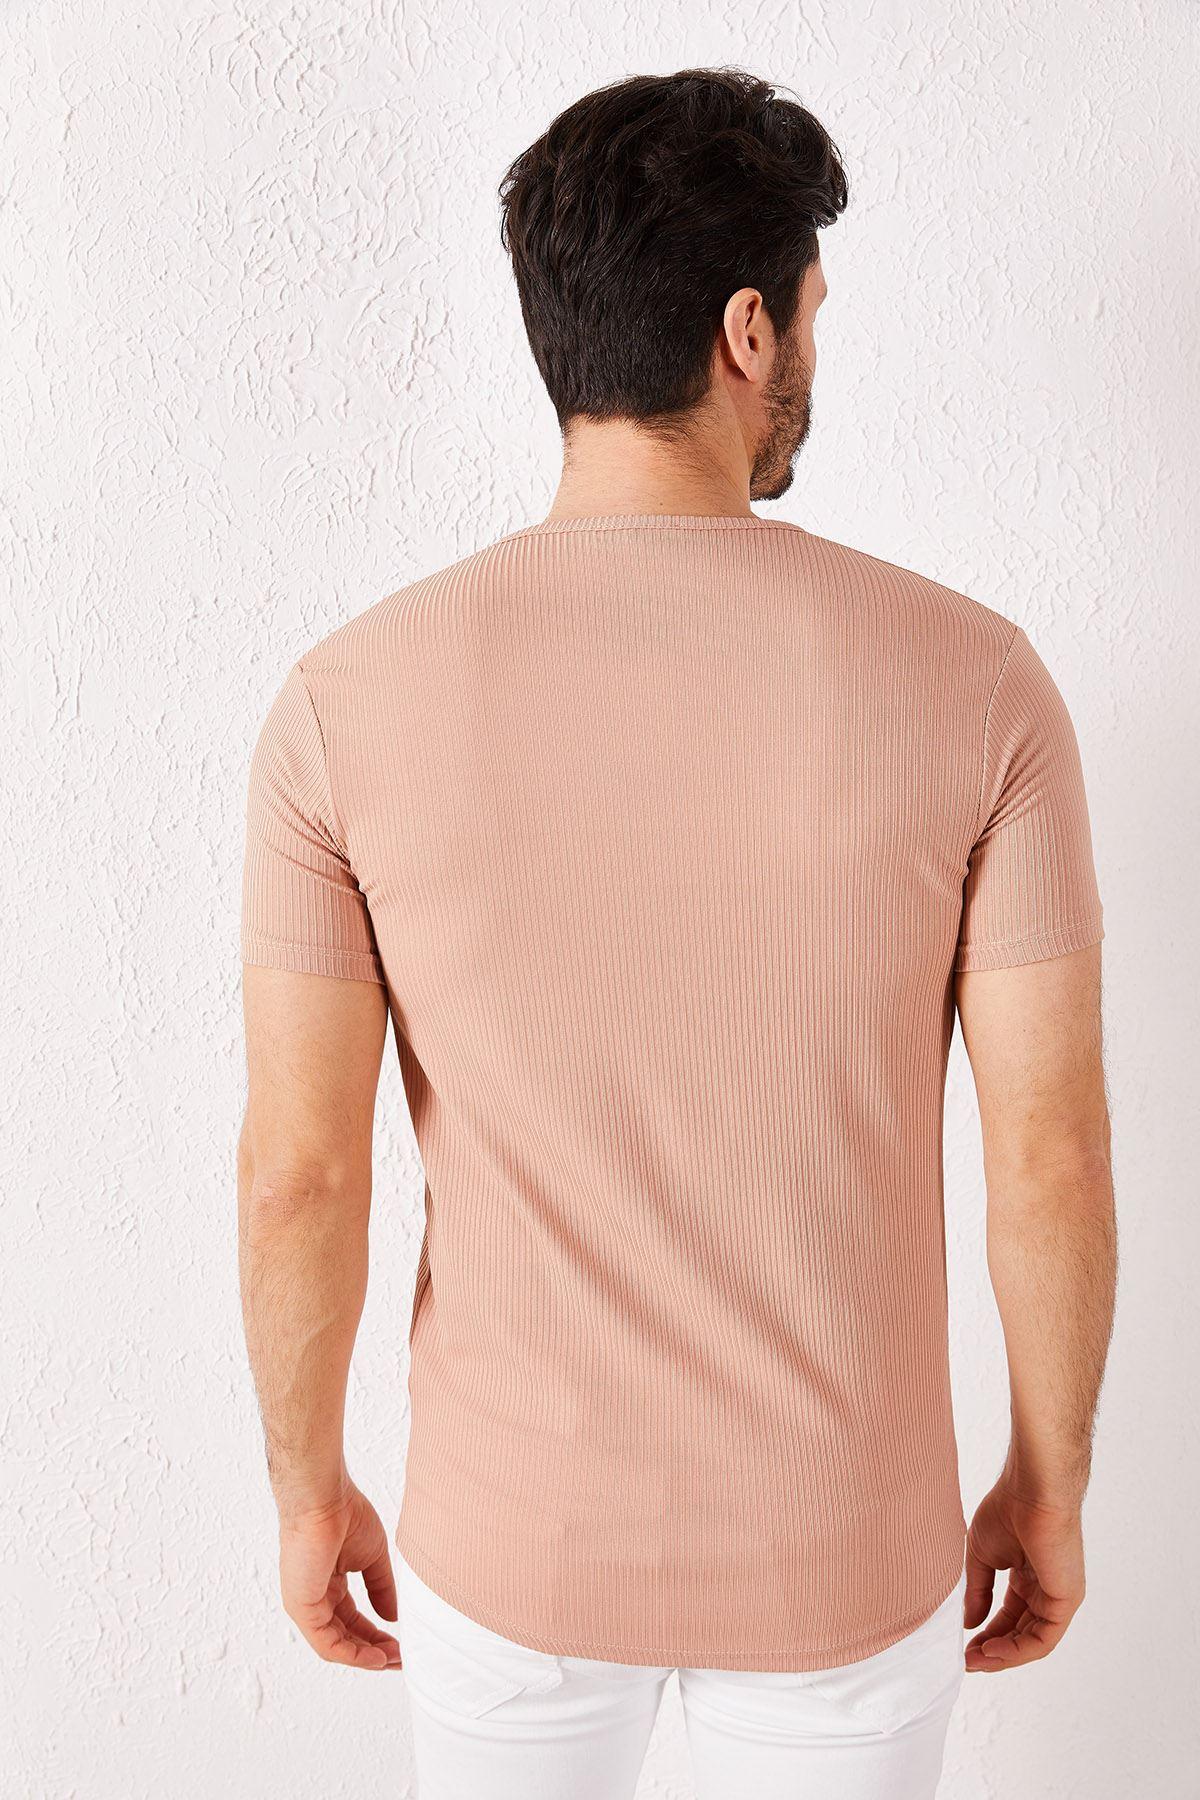 Erkek Fitilli Düğmeli Vizon Tişört